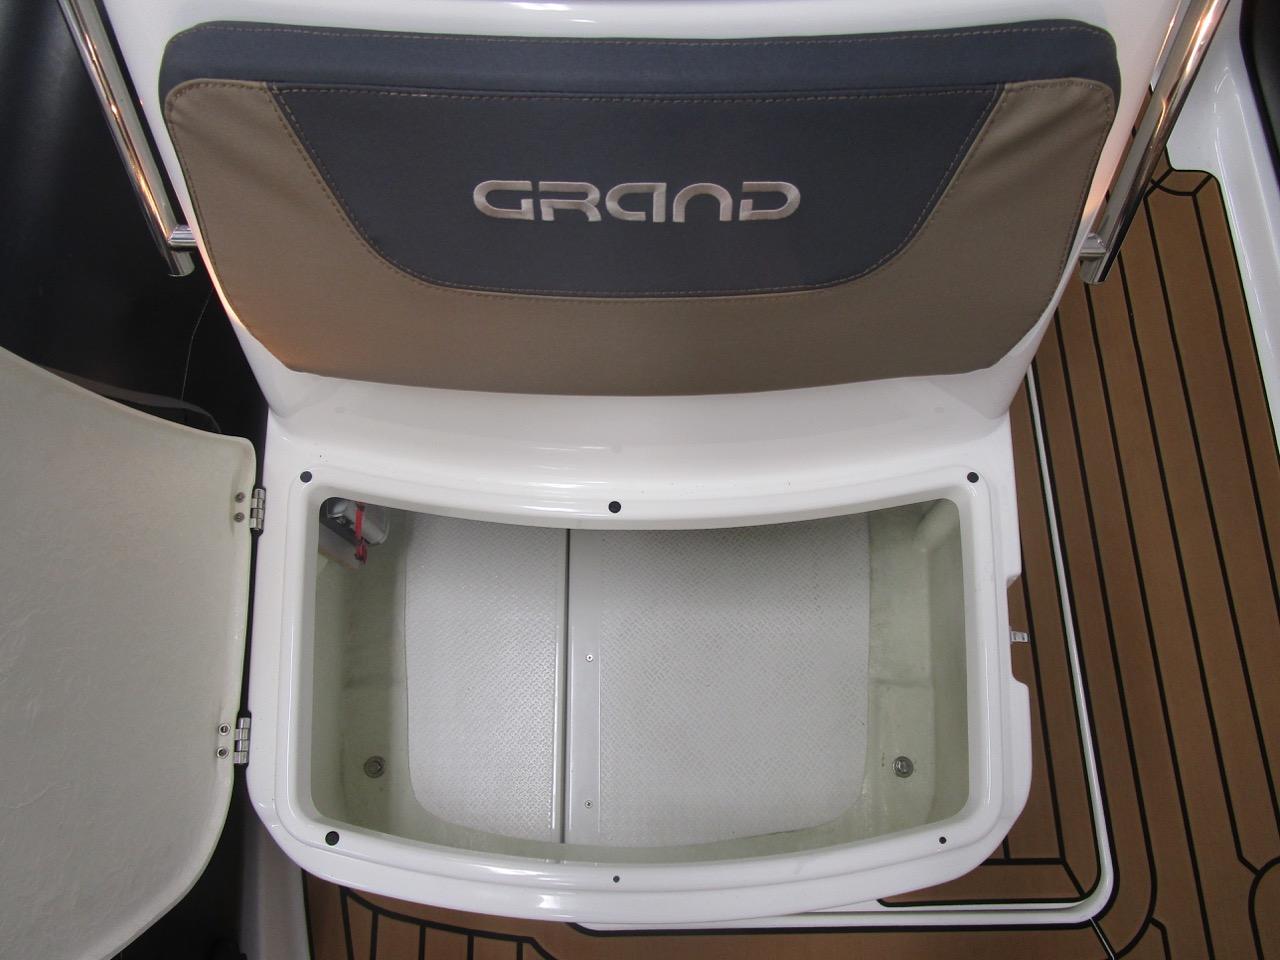 GRAND G500 RIB console front seat storage